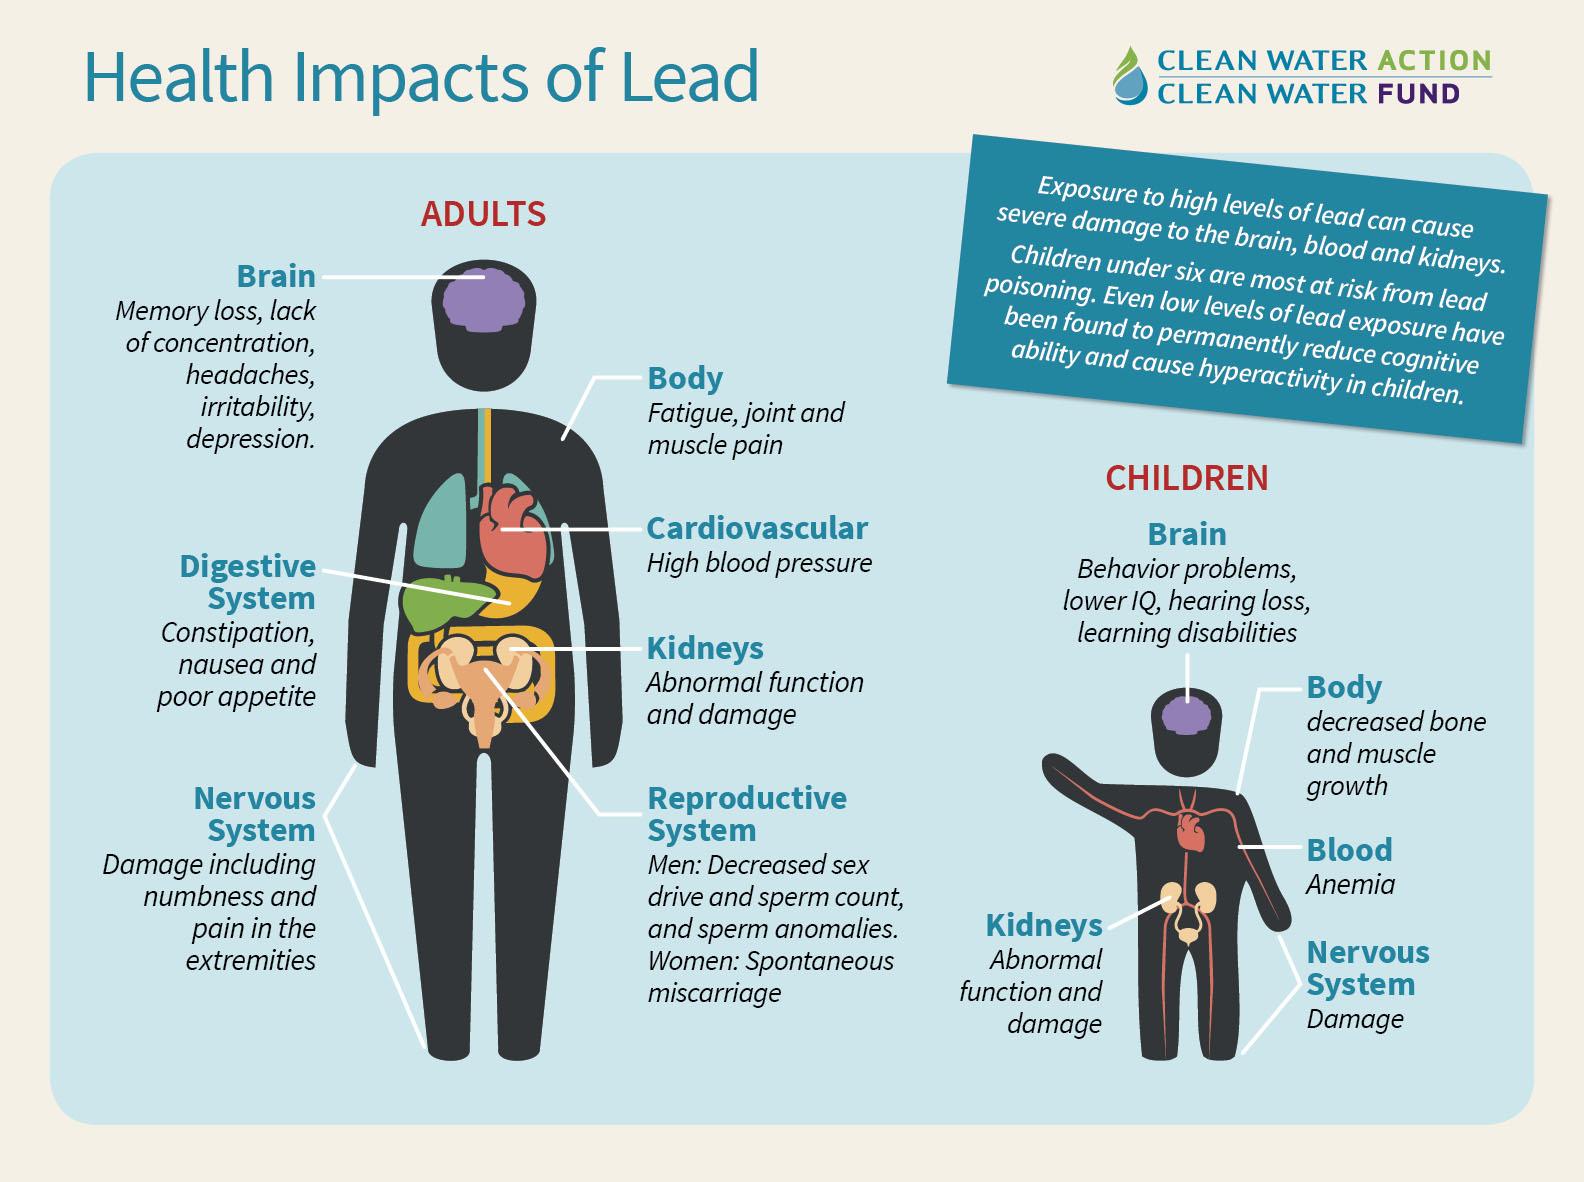 DrinkingWater_Health Impacts of Lead.jpg